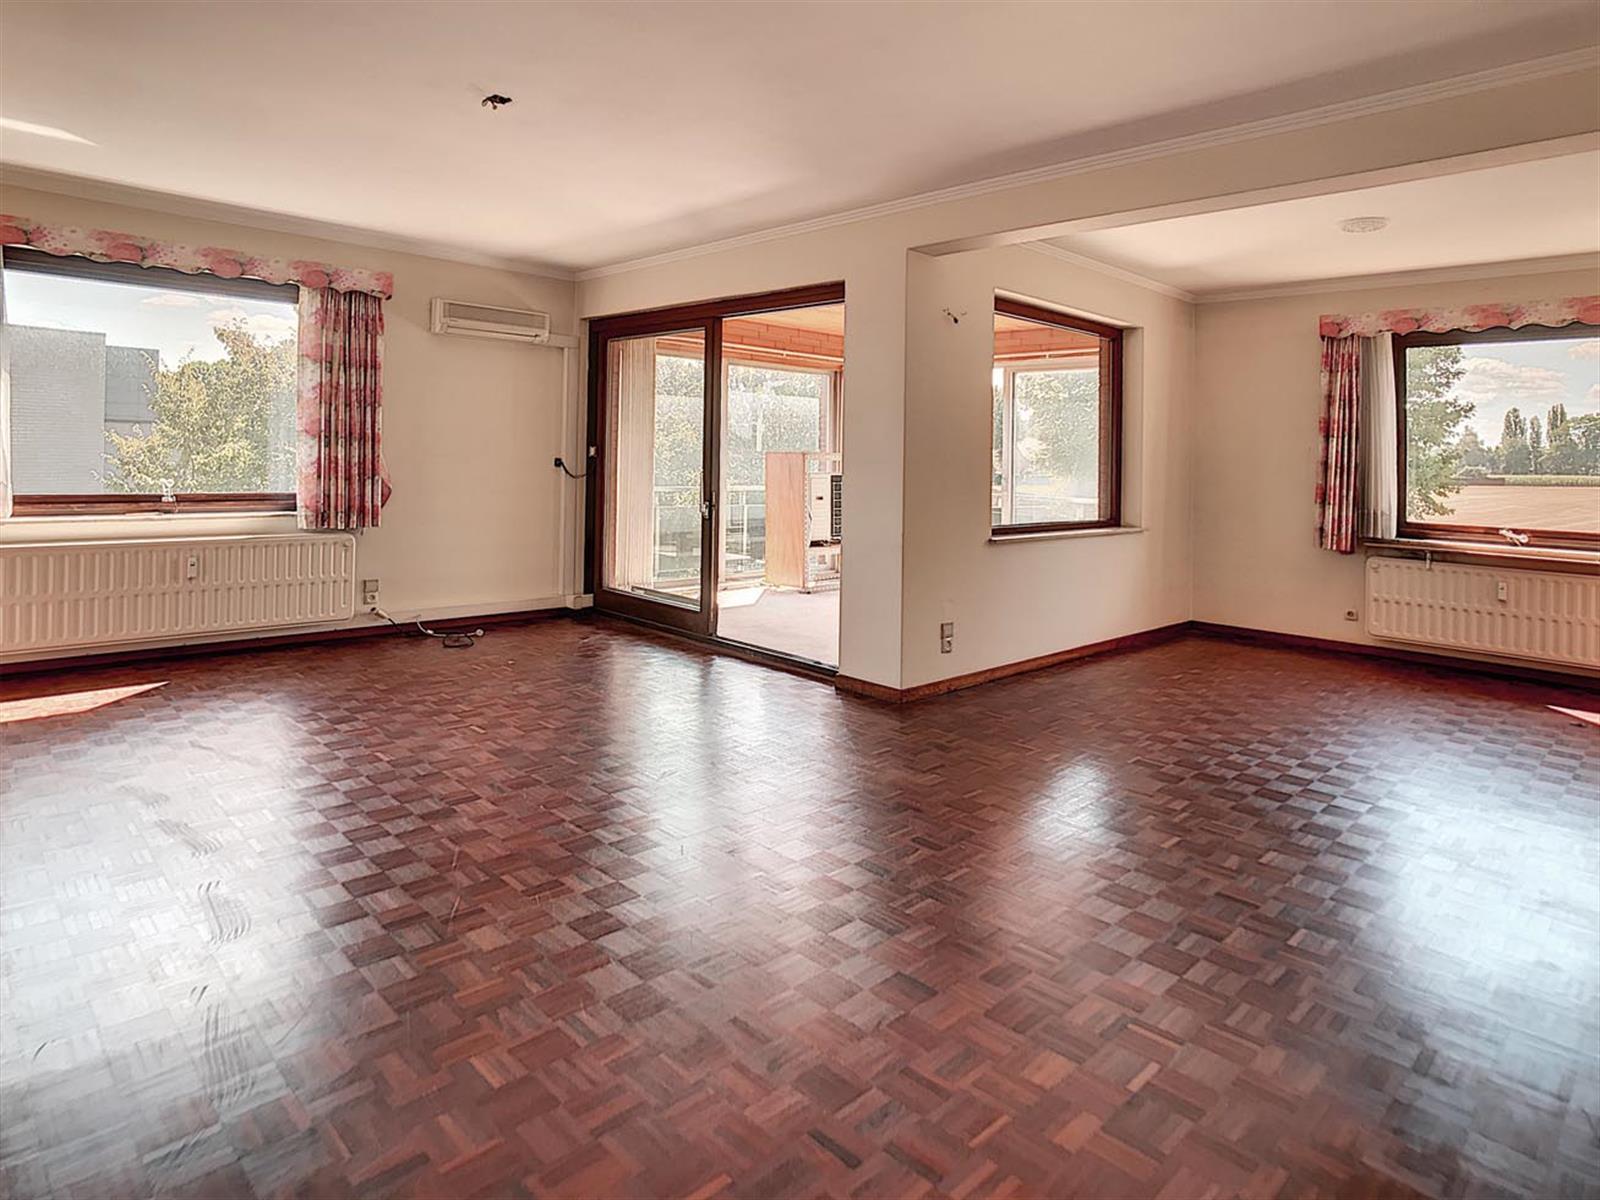 Appartement - Kraainem - #4162574-1